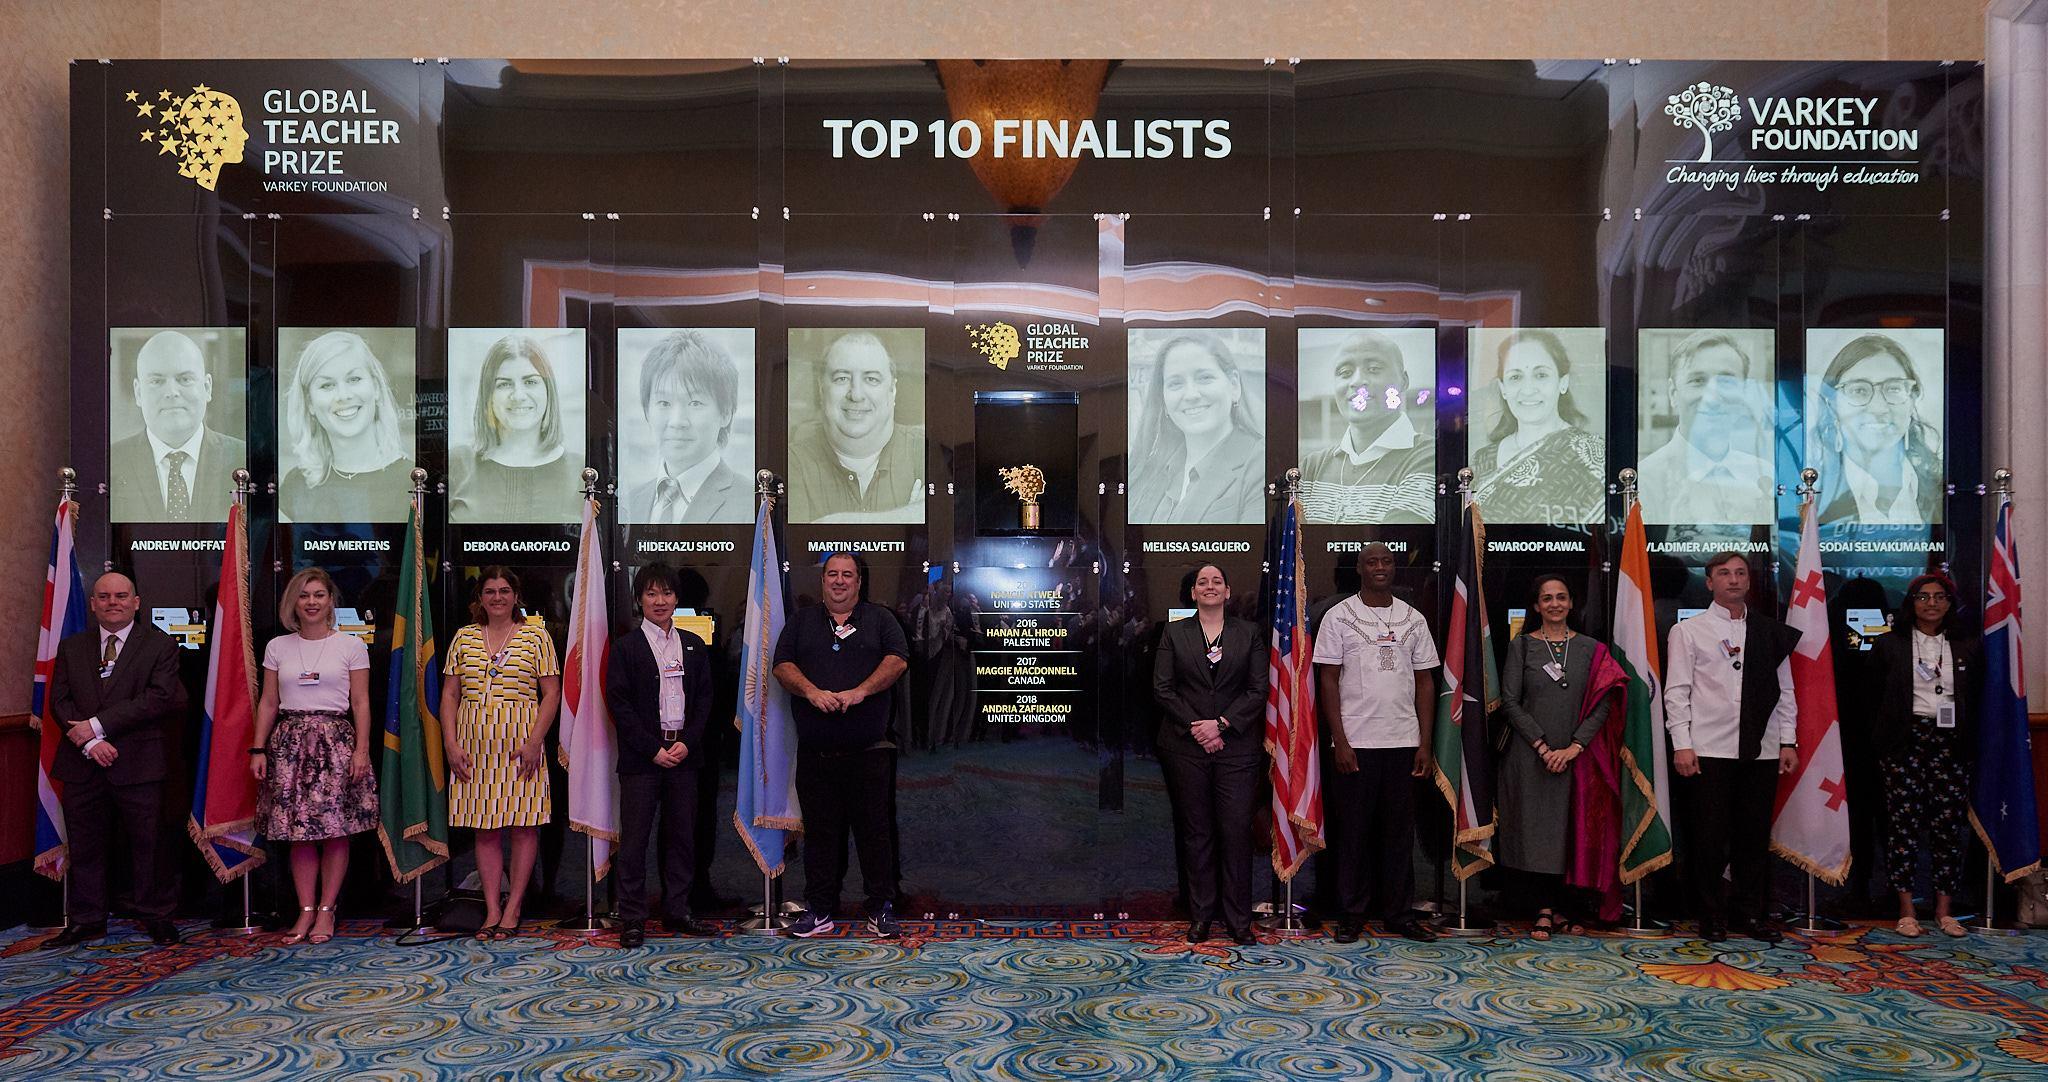 Global Teacher Prize 2019のファイナリスト10名の写真